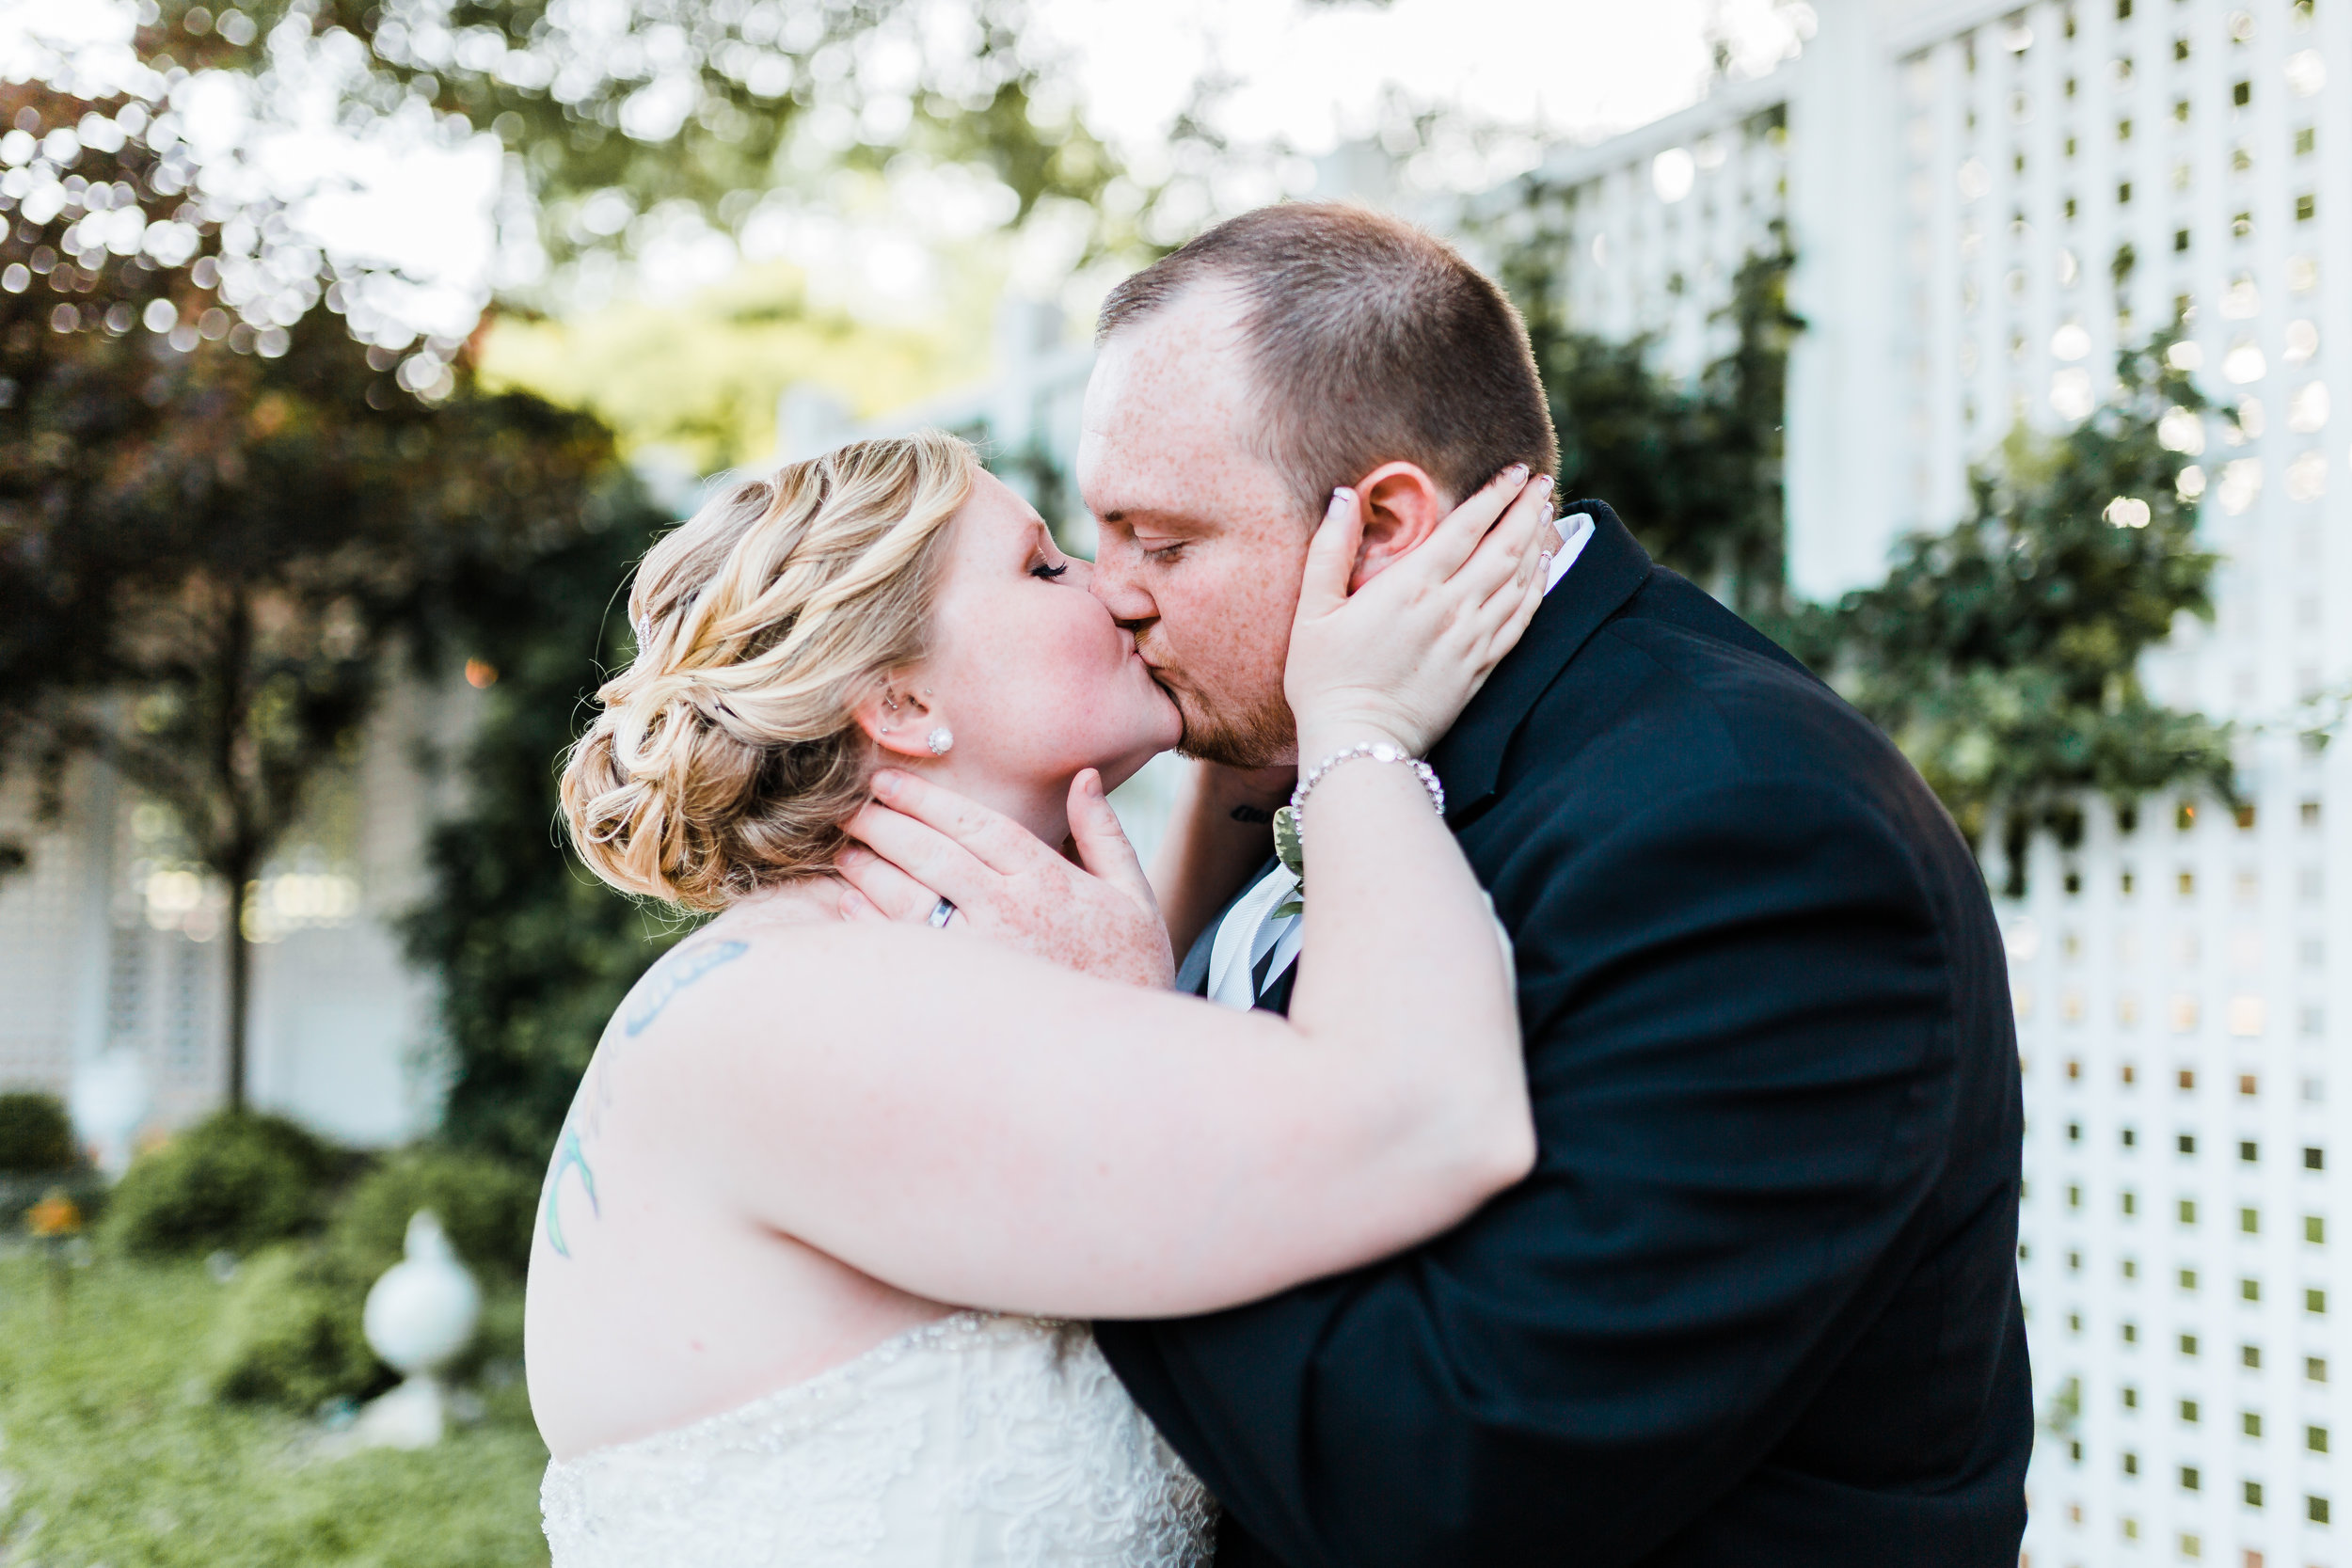 bride and groom kiss romantically on their wedding day - kurtz's beach - md wedding photographer and videographer